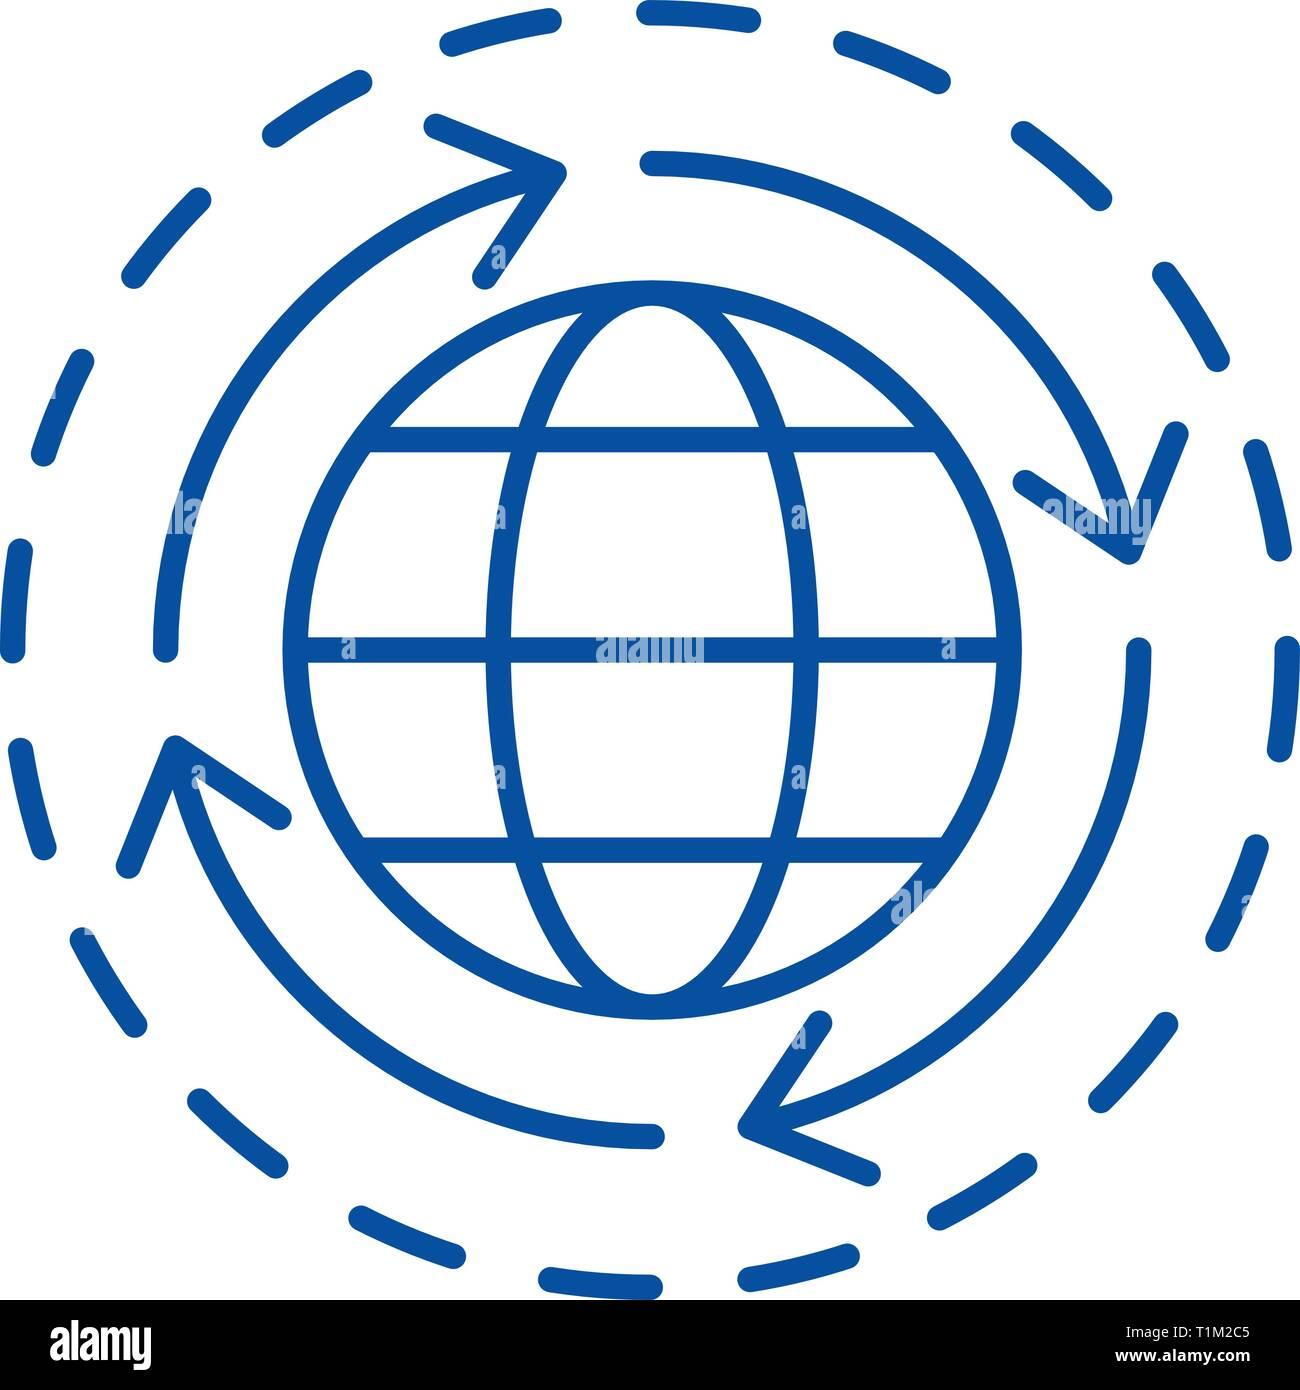 World economy line icon concept. World economy flat  vector symbol, sign, outline illustration. - Stock Image